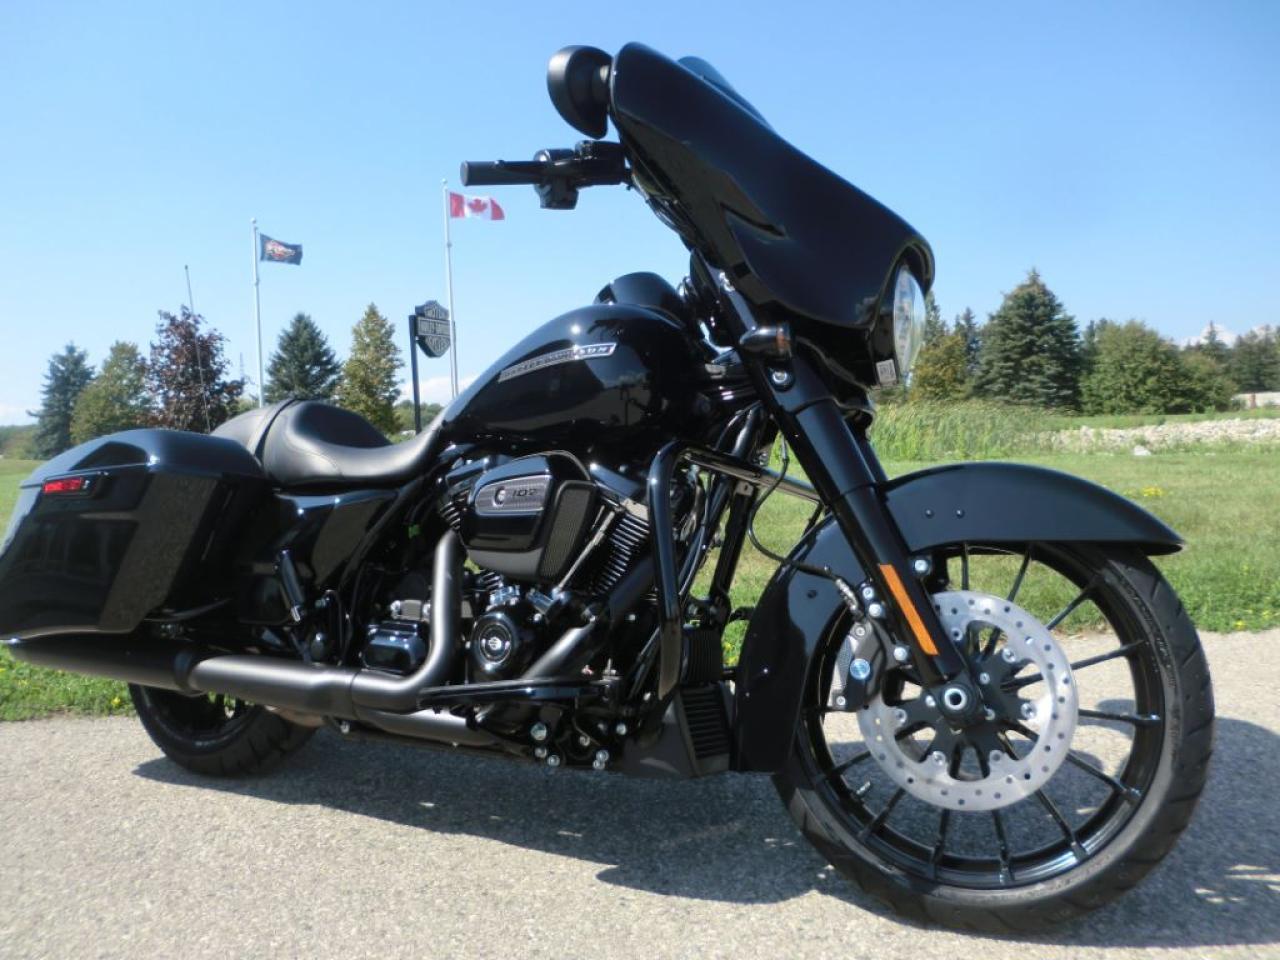 2018 Harley-Davidson Street Glide FLHXS Street Glide Special